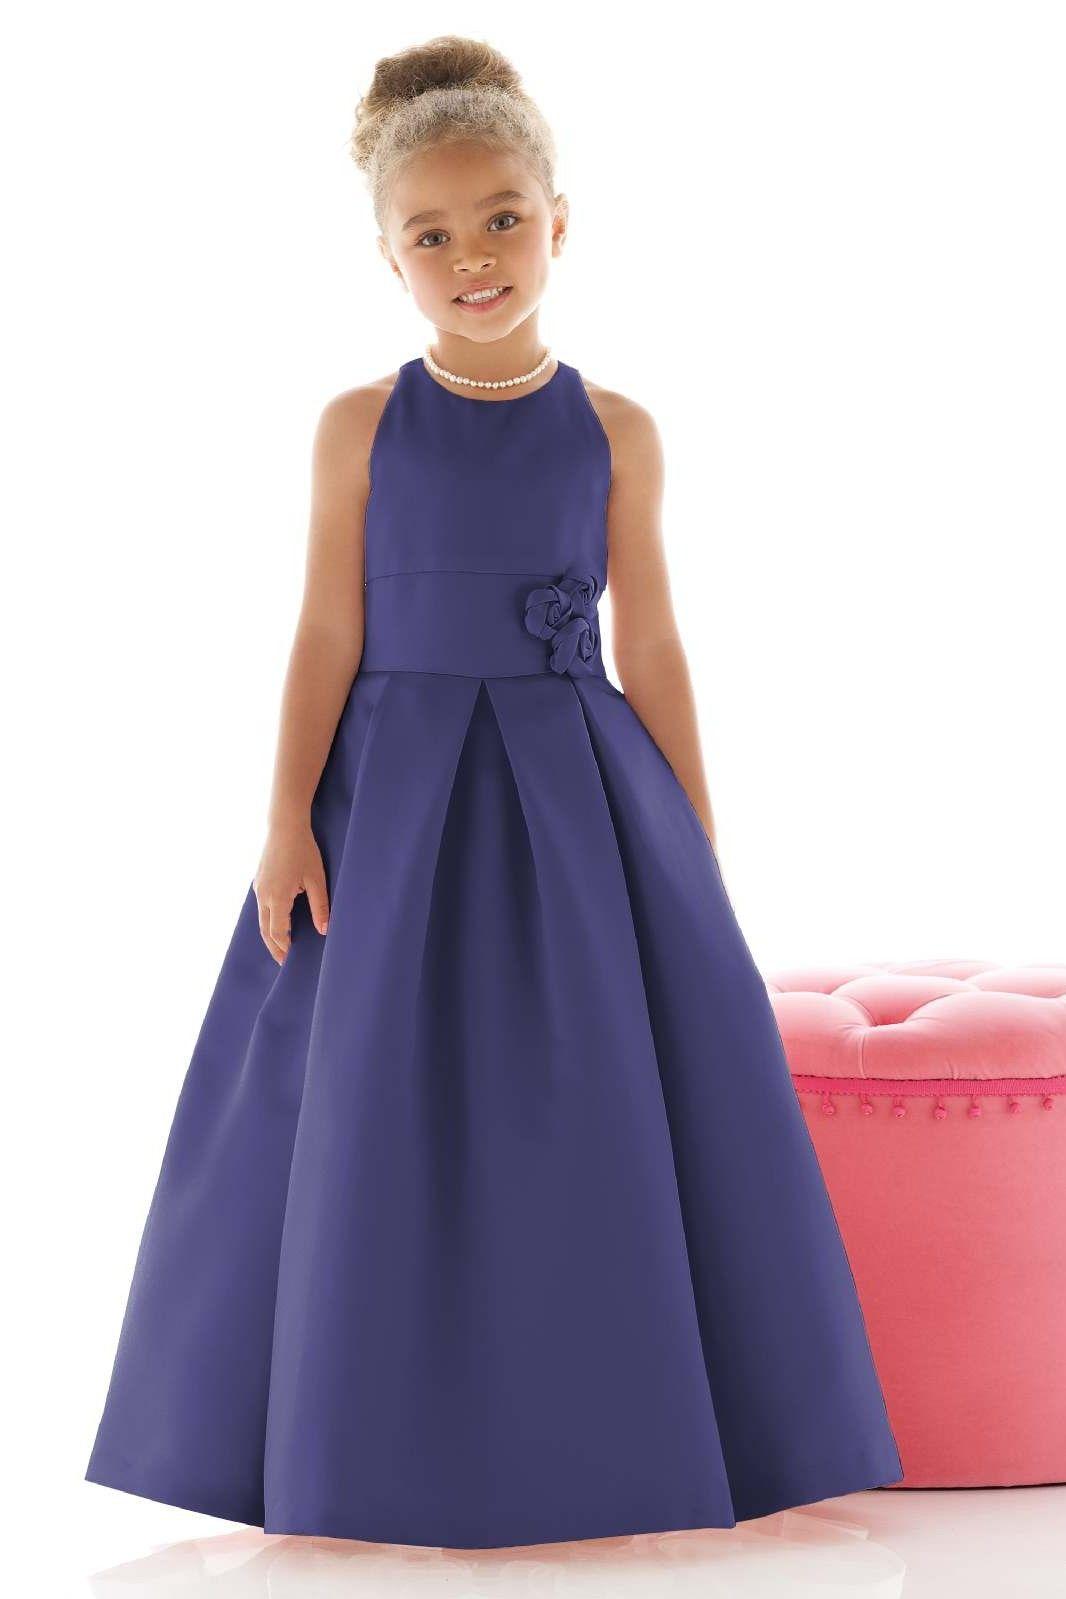 Sweetie Pie 106 Flower Girl or Communion Dress | Wedding | Pinterest ...